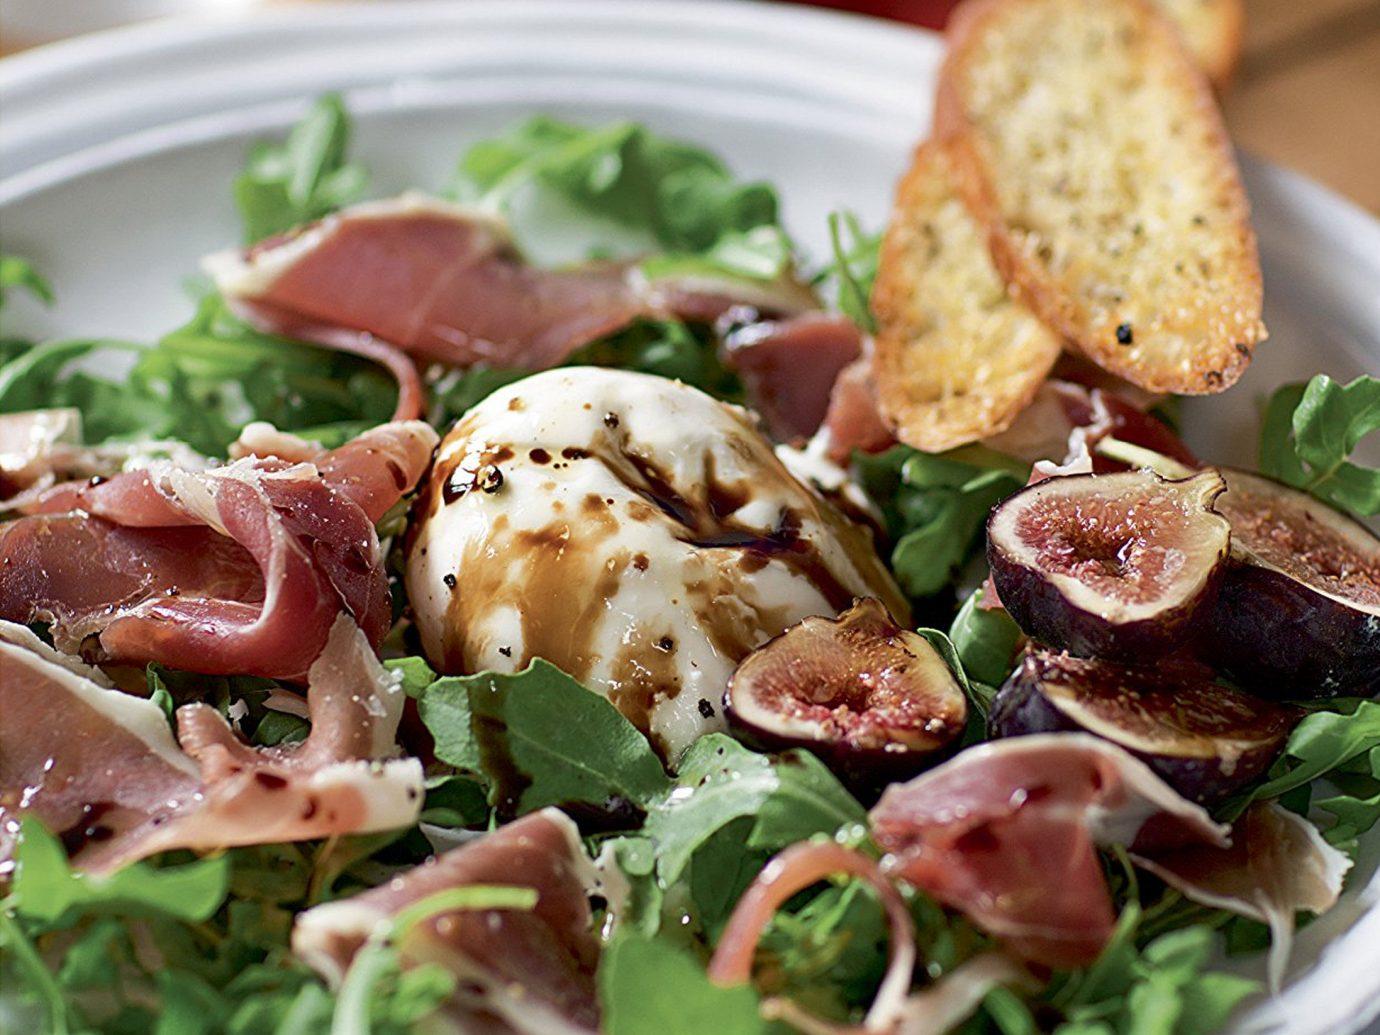 Food + Drink food plate dish salad meat cuisine meal produce caesar salad lunch vegetable